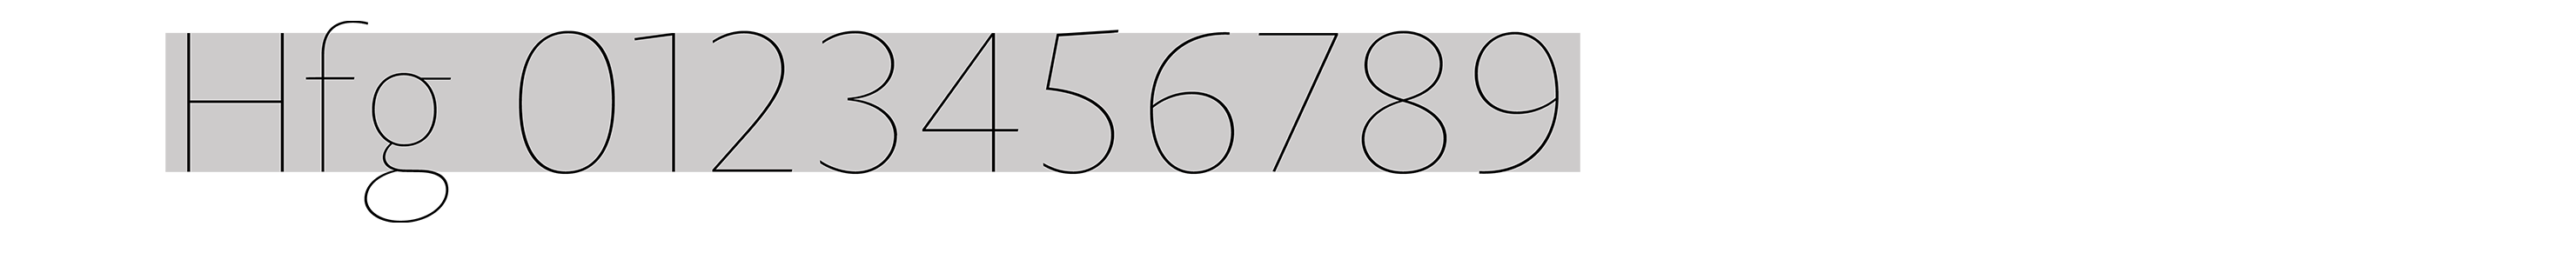 Typeface-Novel-Sans-Hairline-F10-Atlas-Font-Foundry